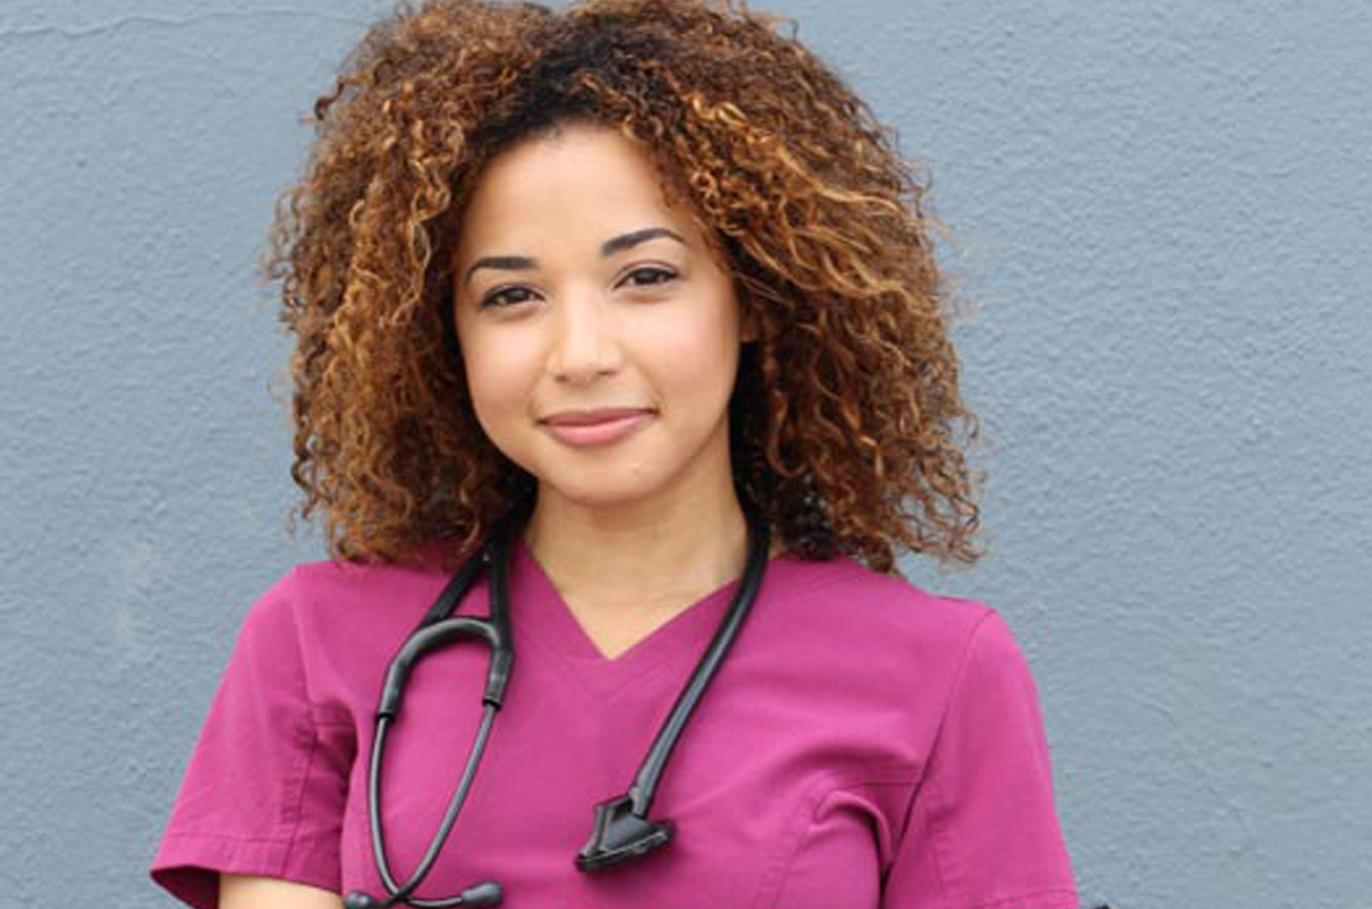 certified nurses assistant